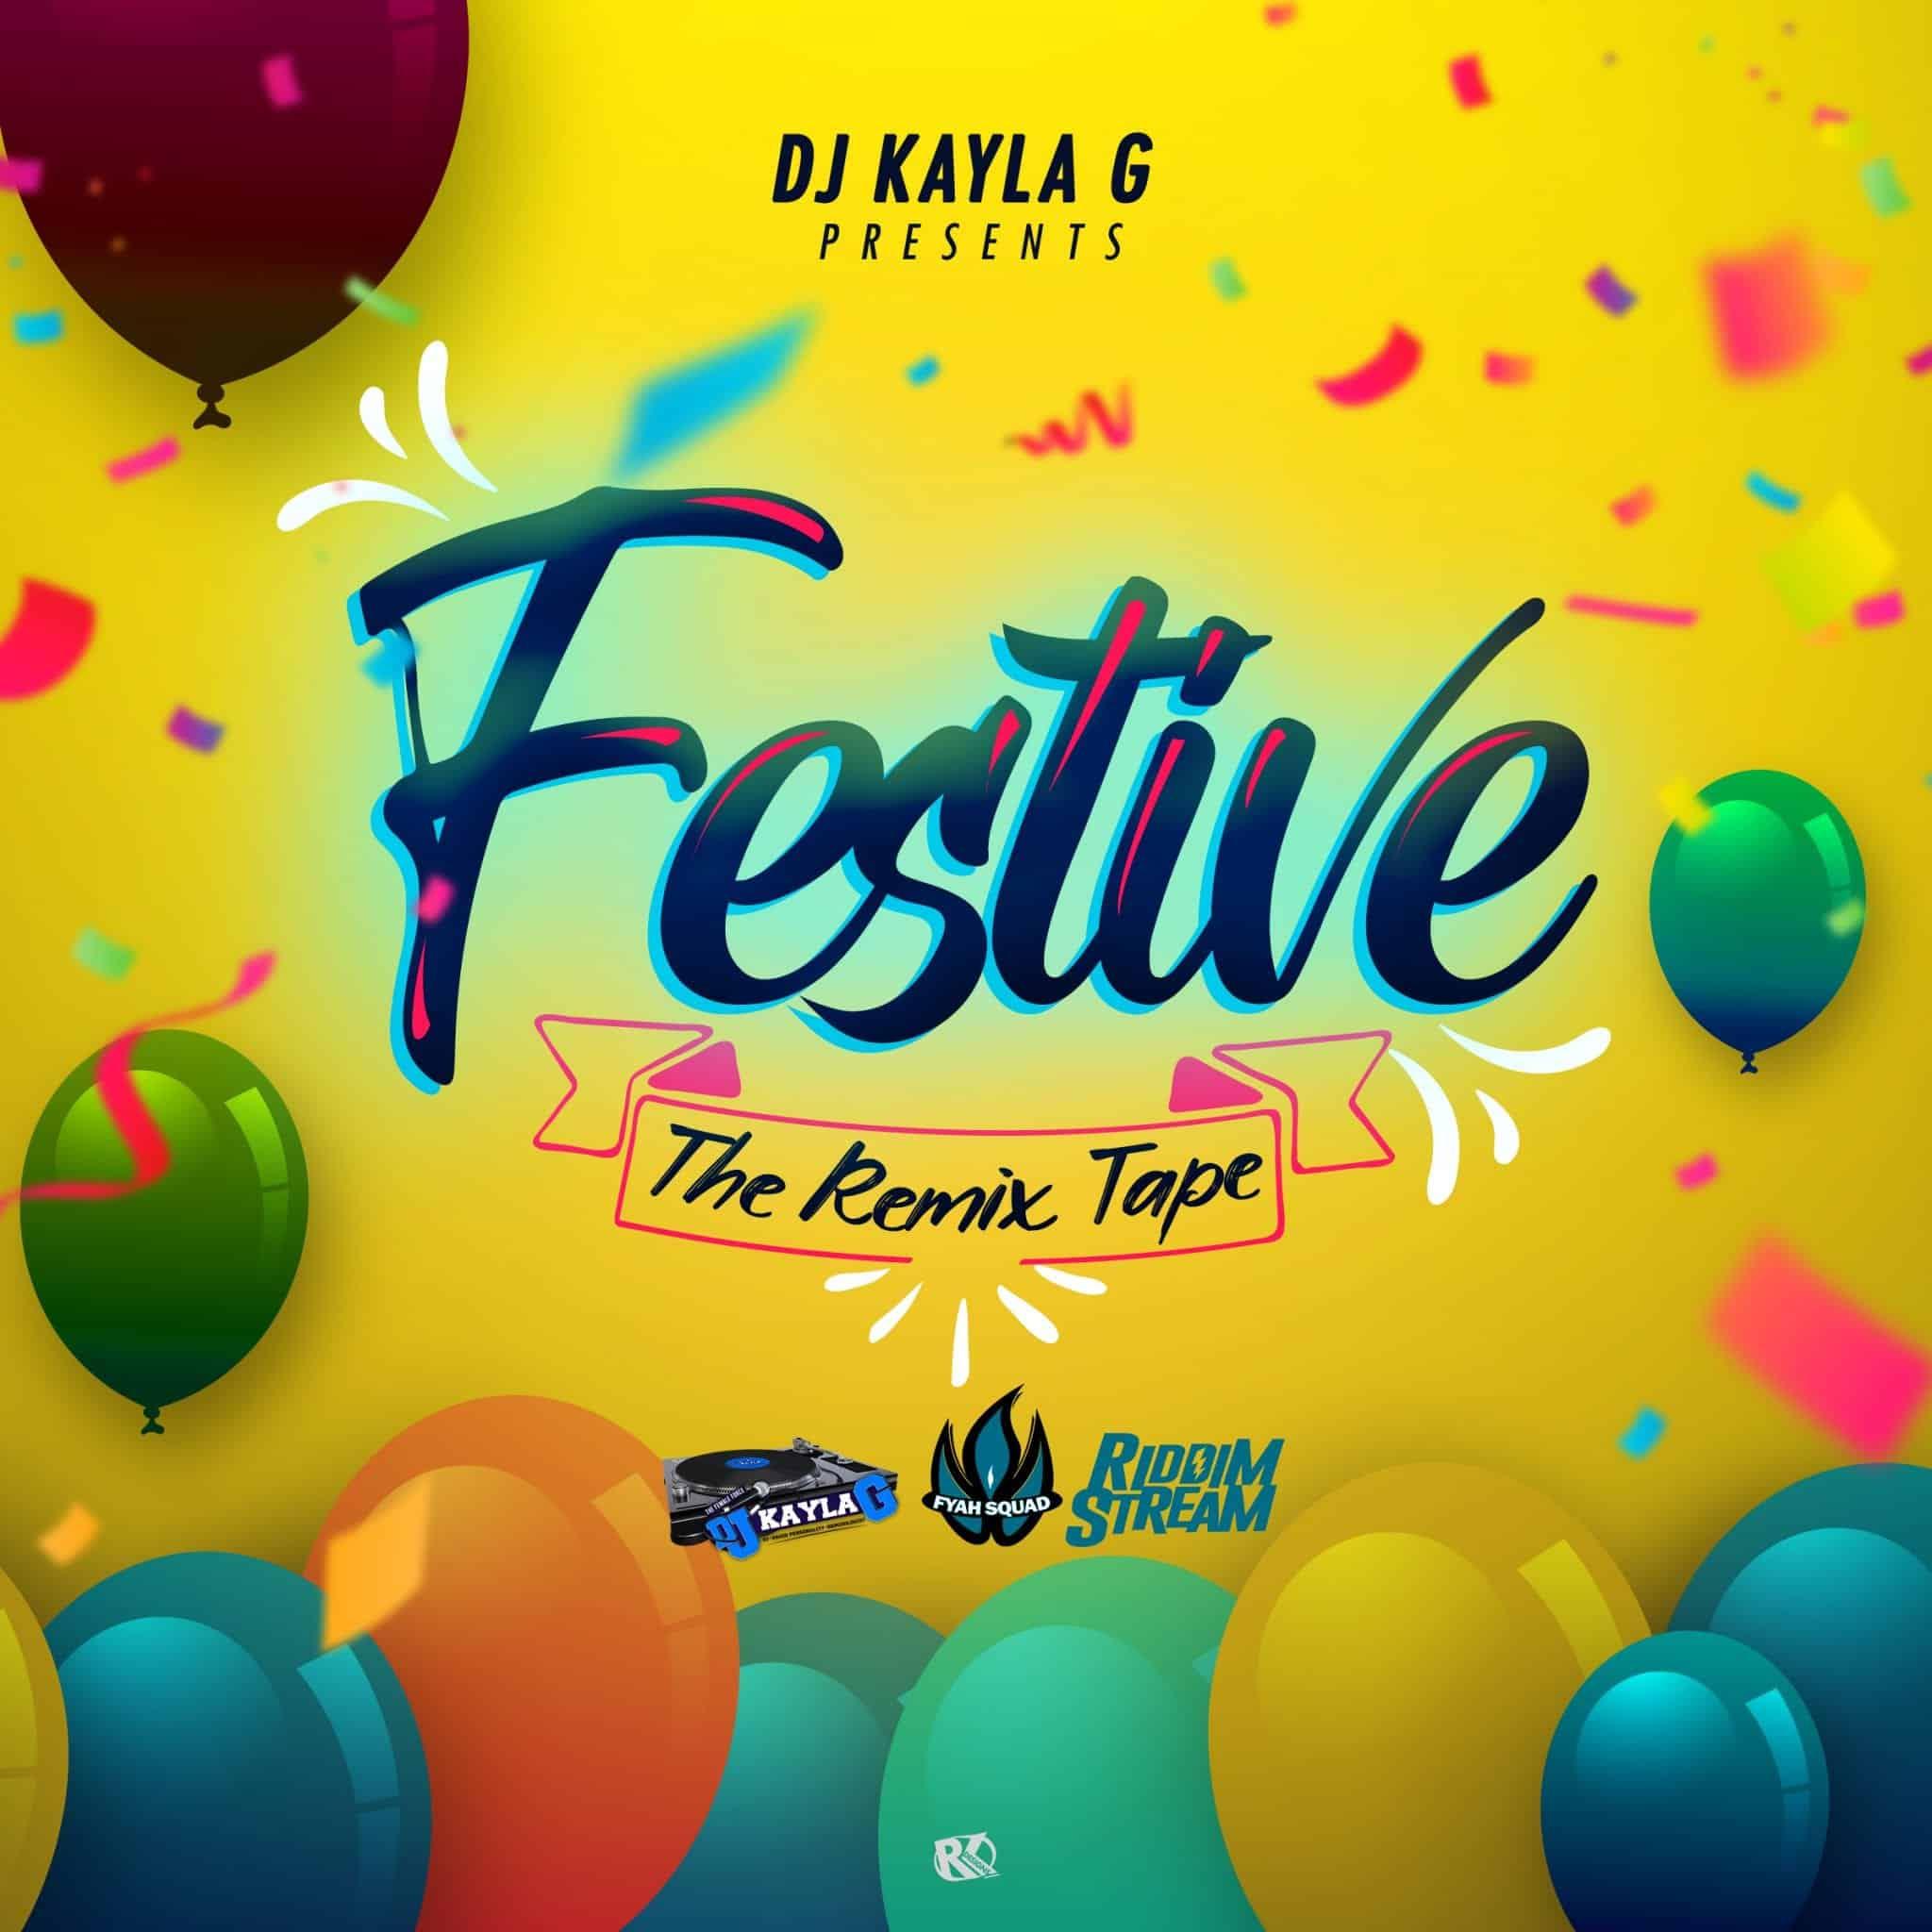 DJ Kayla G - FESTIVE: The Remix Tape (2020 Mixtape)